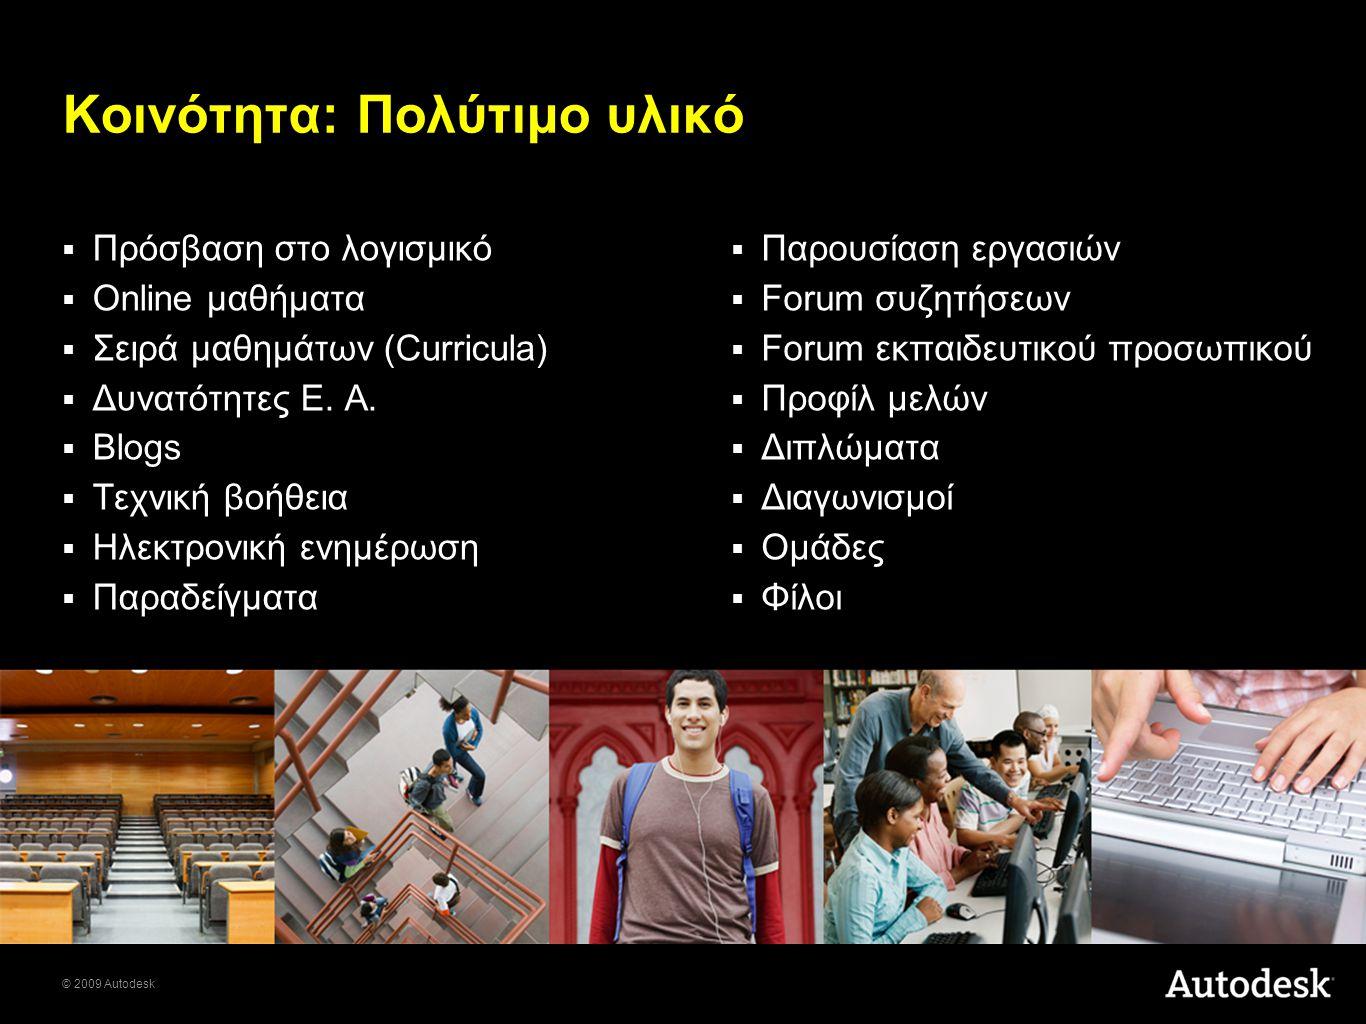 © 2009 Autodesk Βήμα 1: Επιλογή γλώσσας Βήμα 2: Δεν έχετε email από την Σχολή σας; Πατήστε εδώ! Φοιτητής προσκαλεί κάποιον καθηγητή